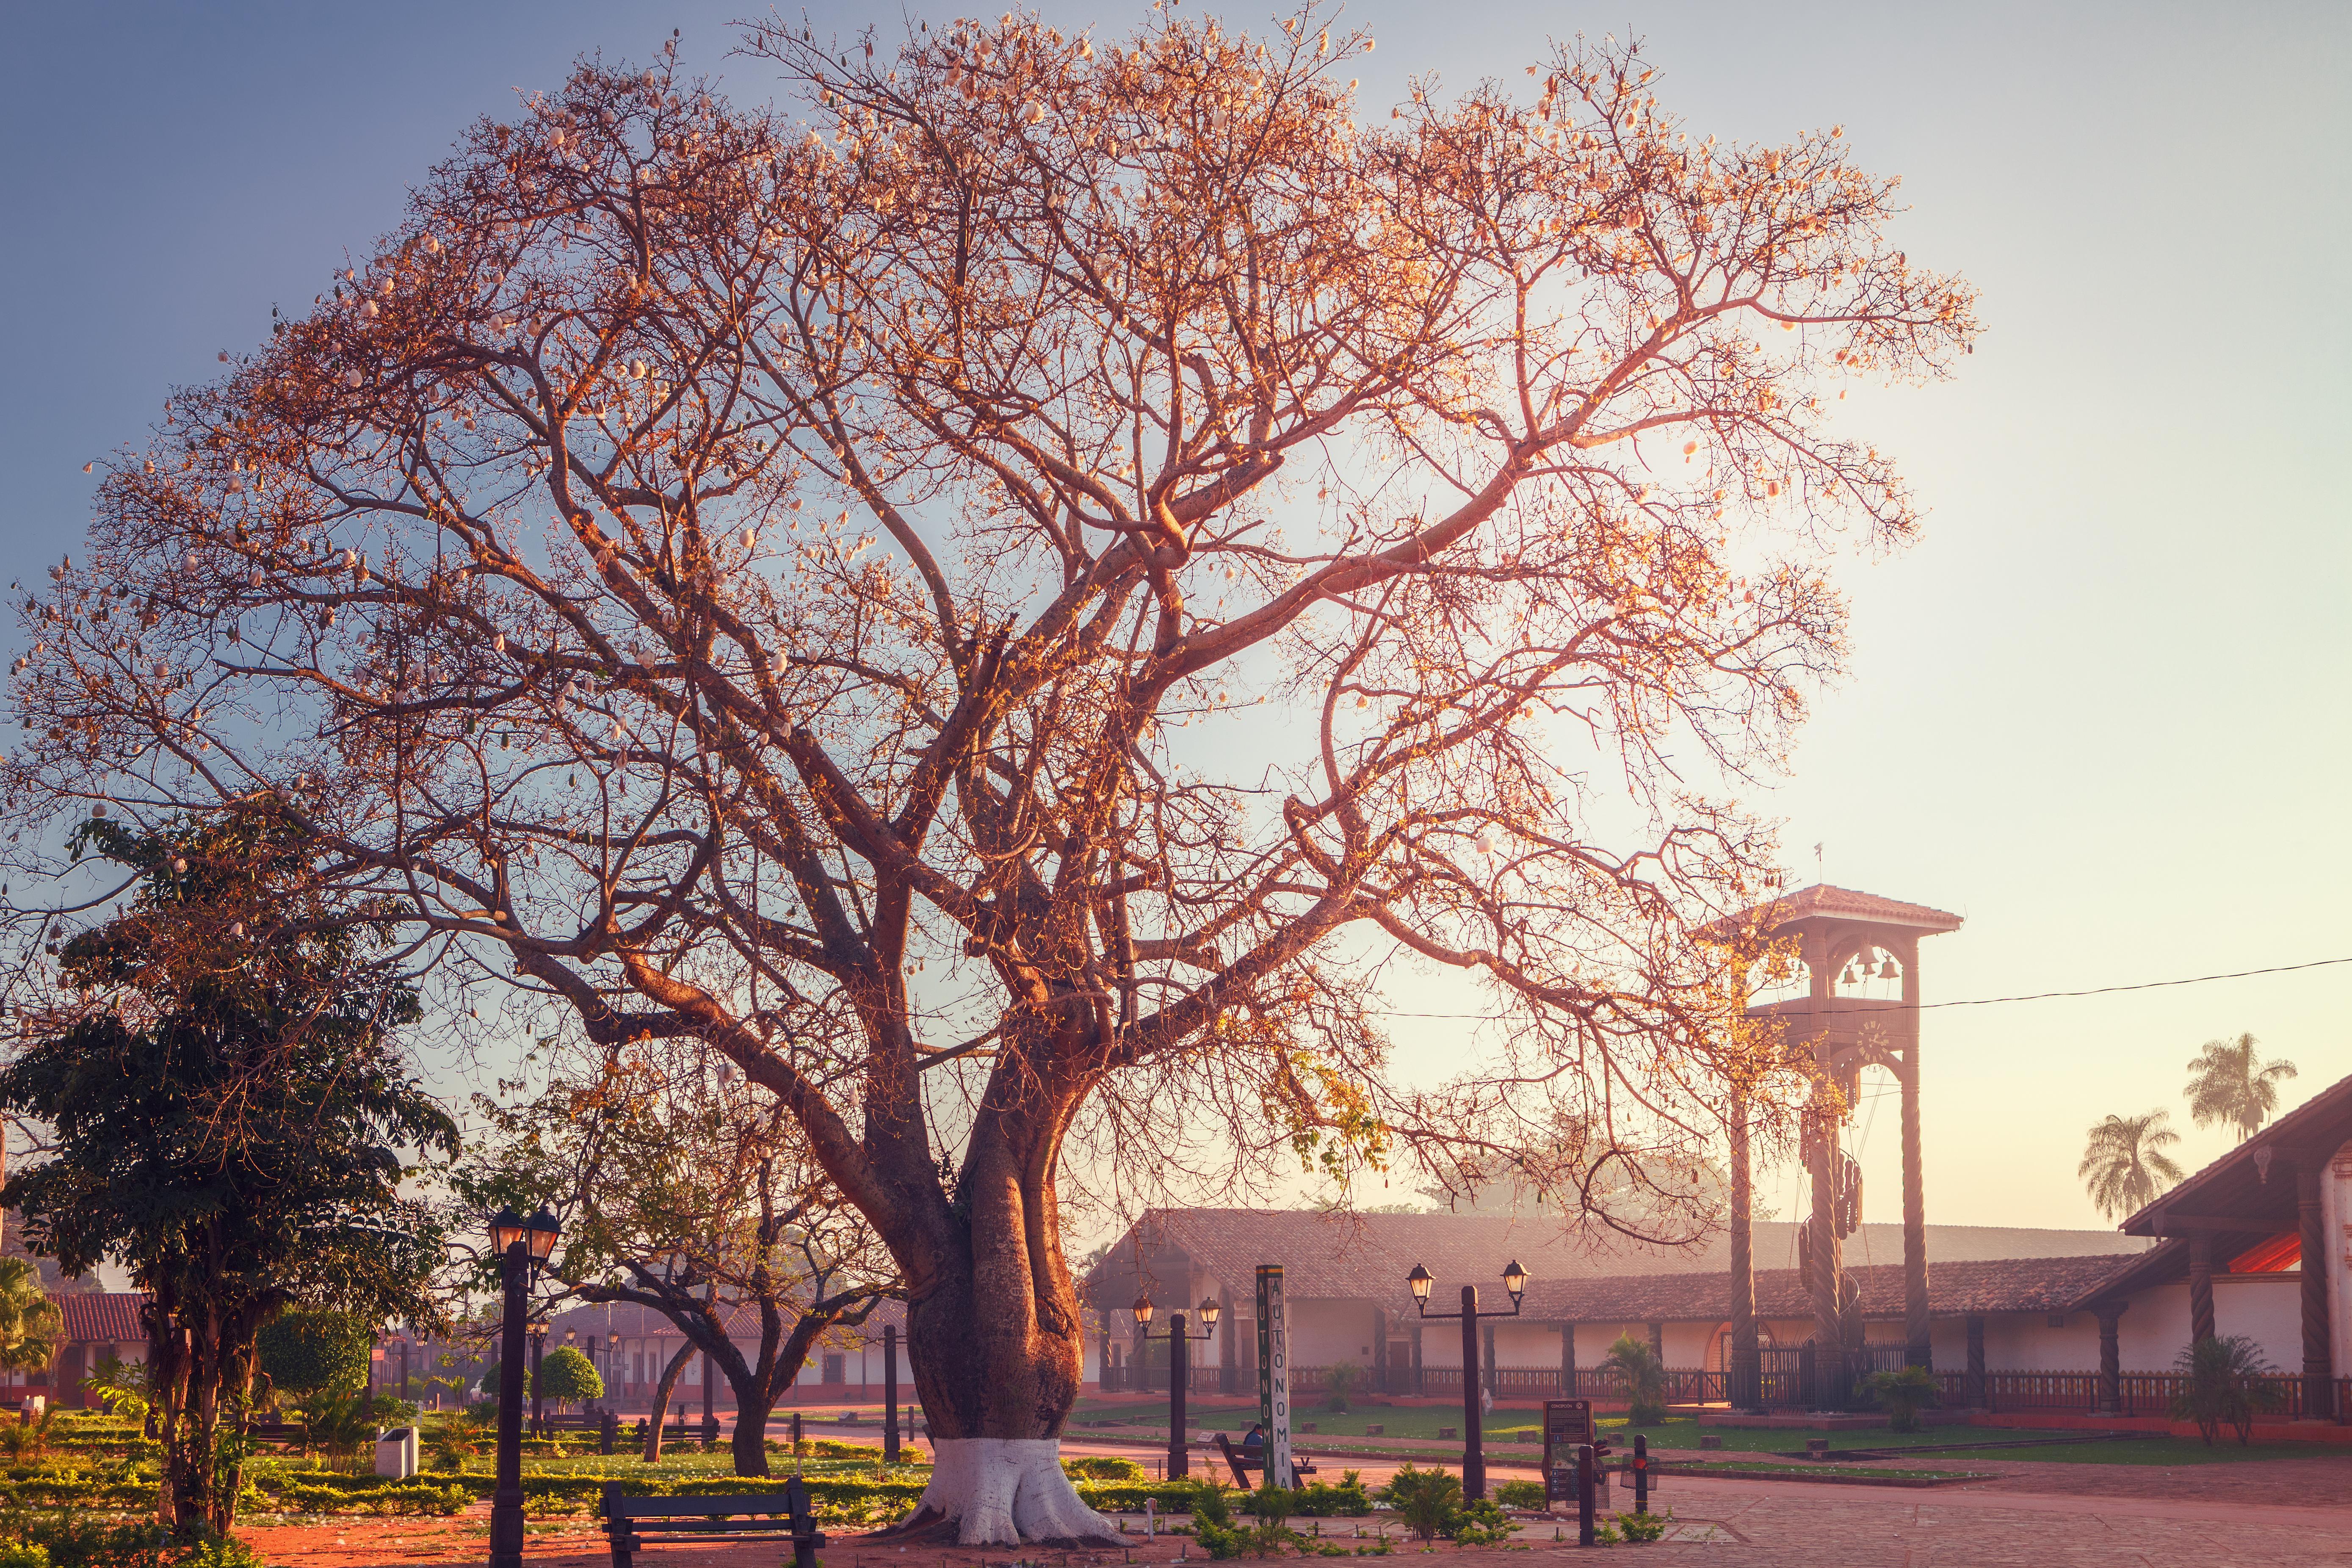 Visita 360º a la Plaza Central - Bolivia Gran Viaje Lo mejor de Bolivia